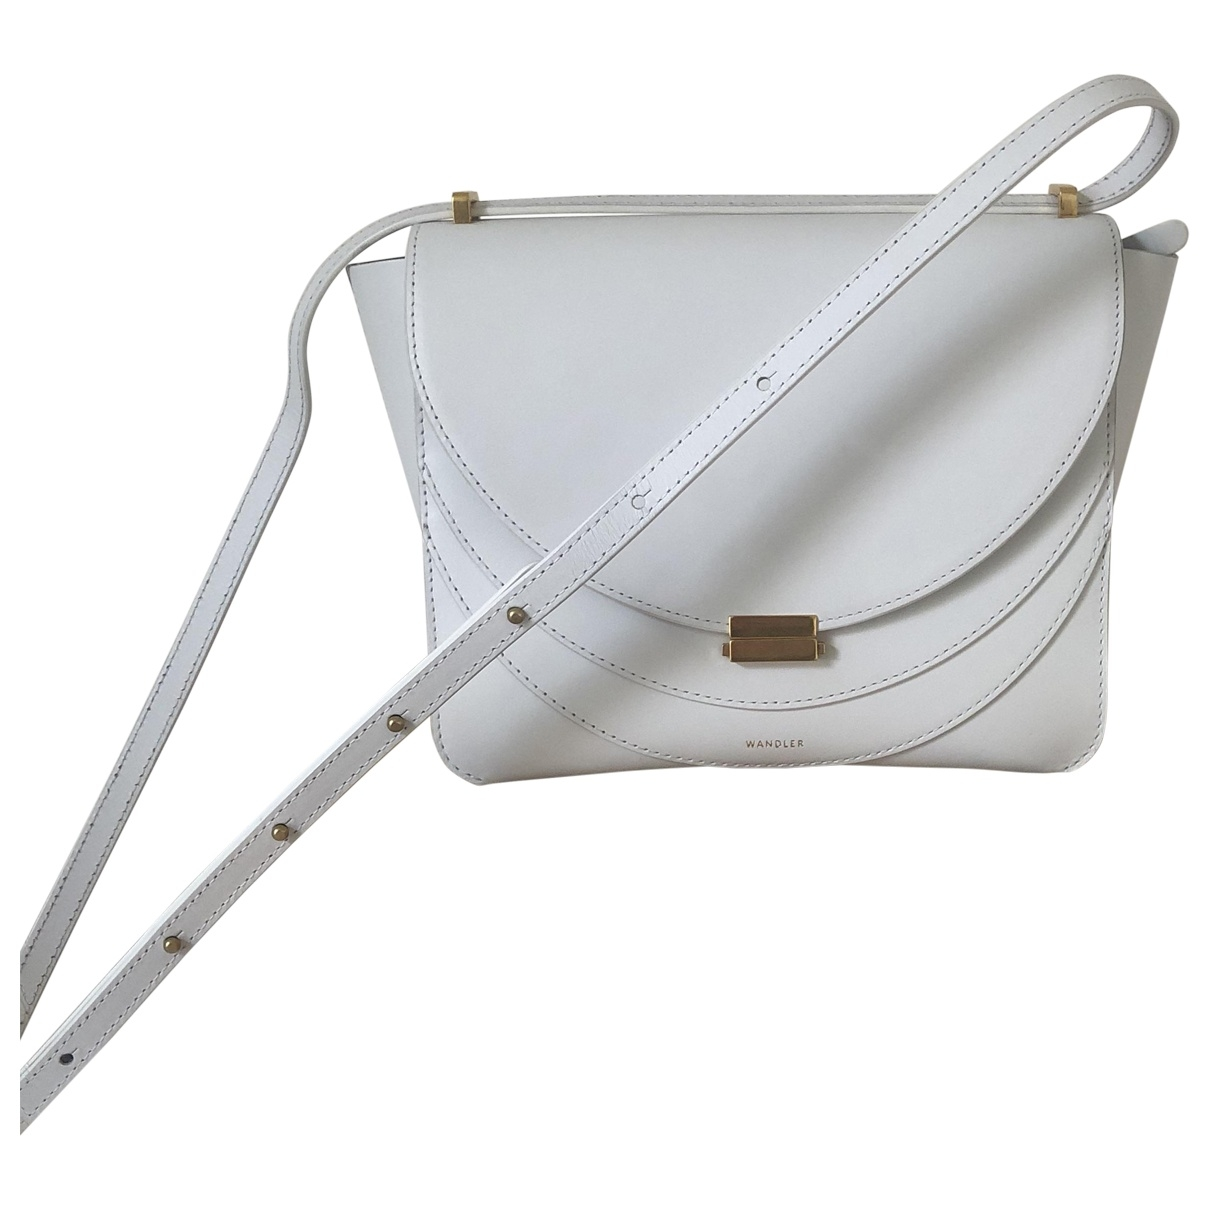 Wandler \N Handtasche in  Weiss Leder